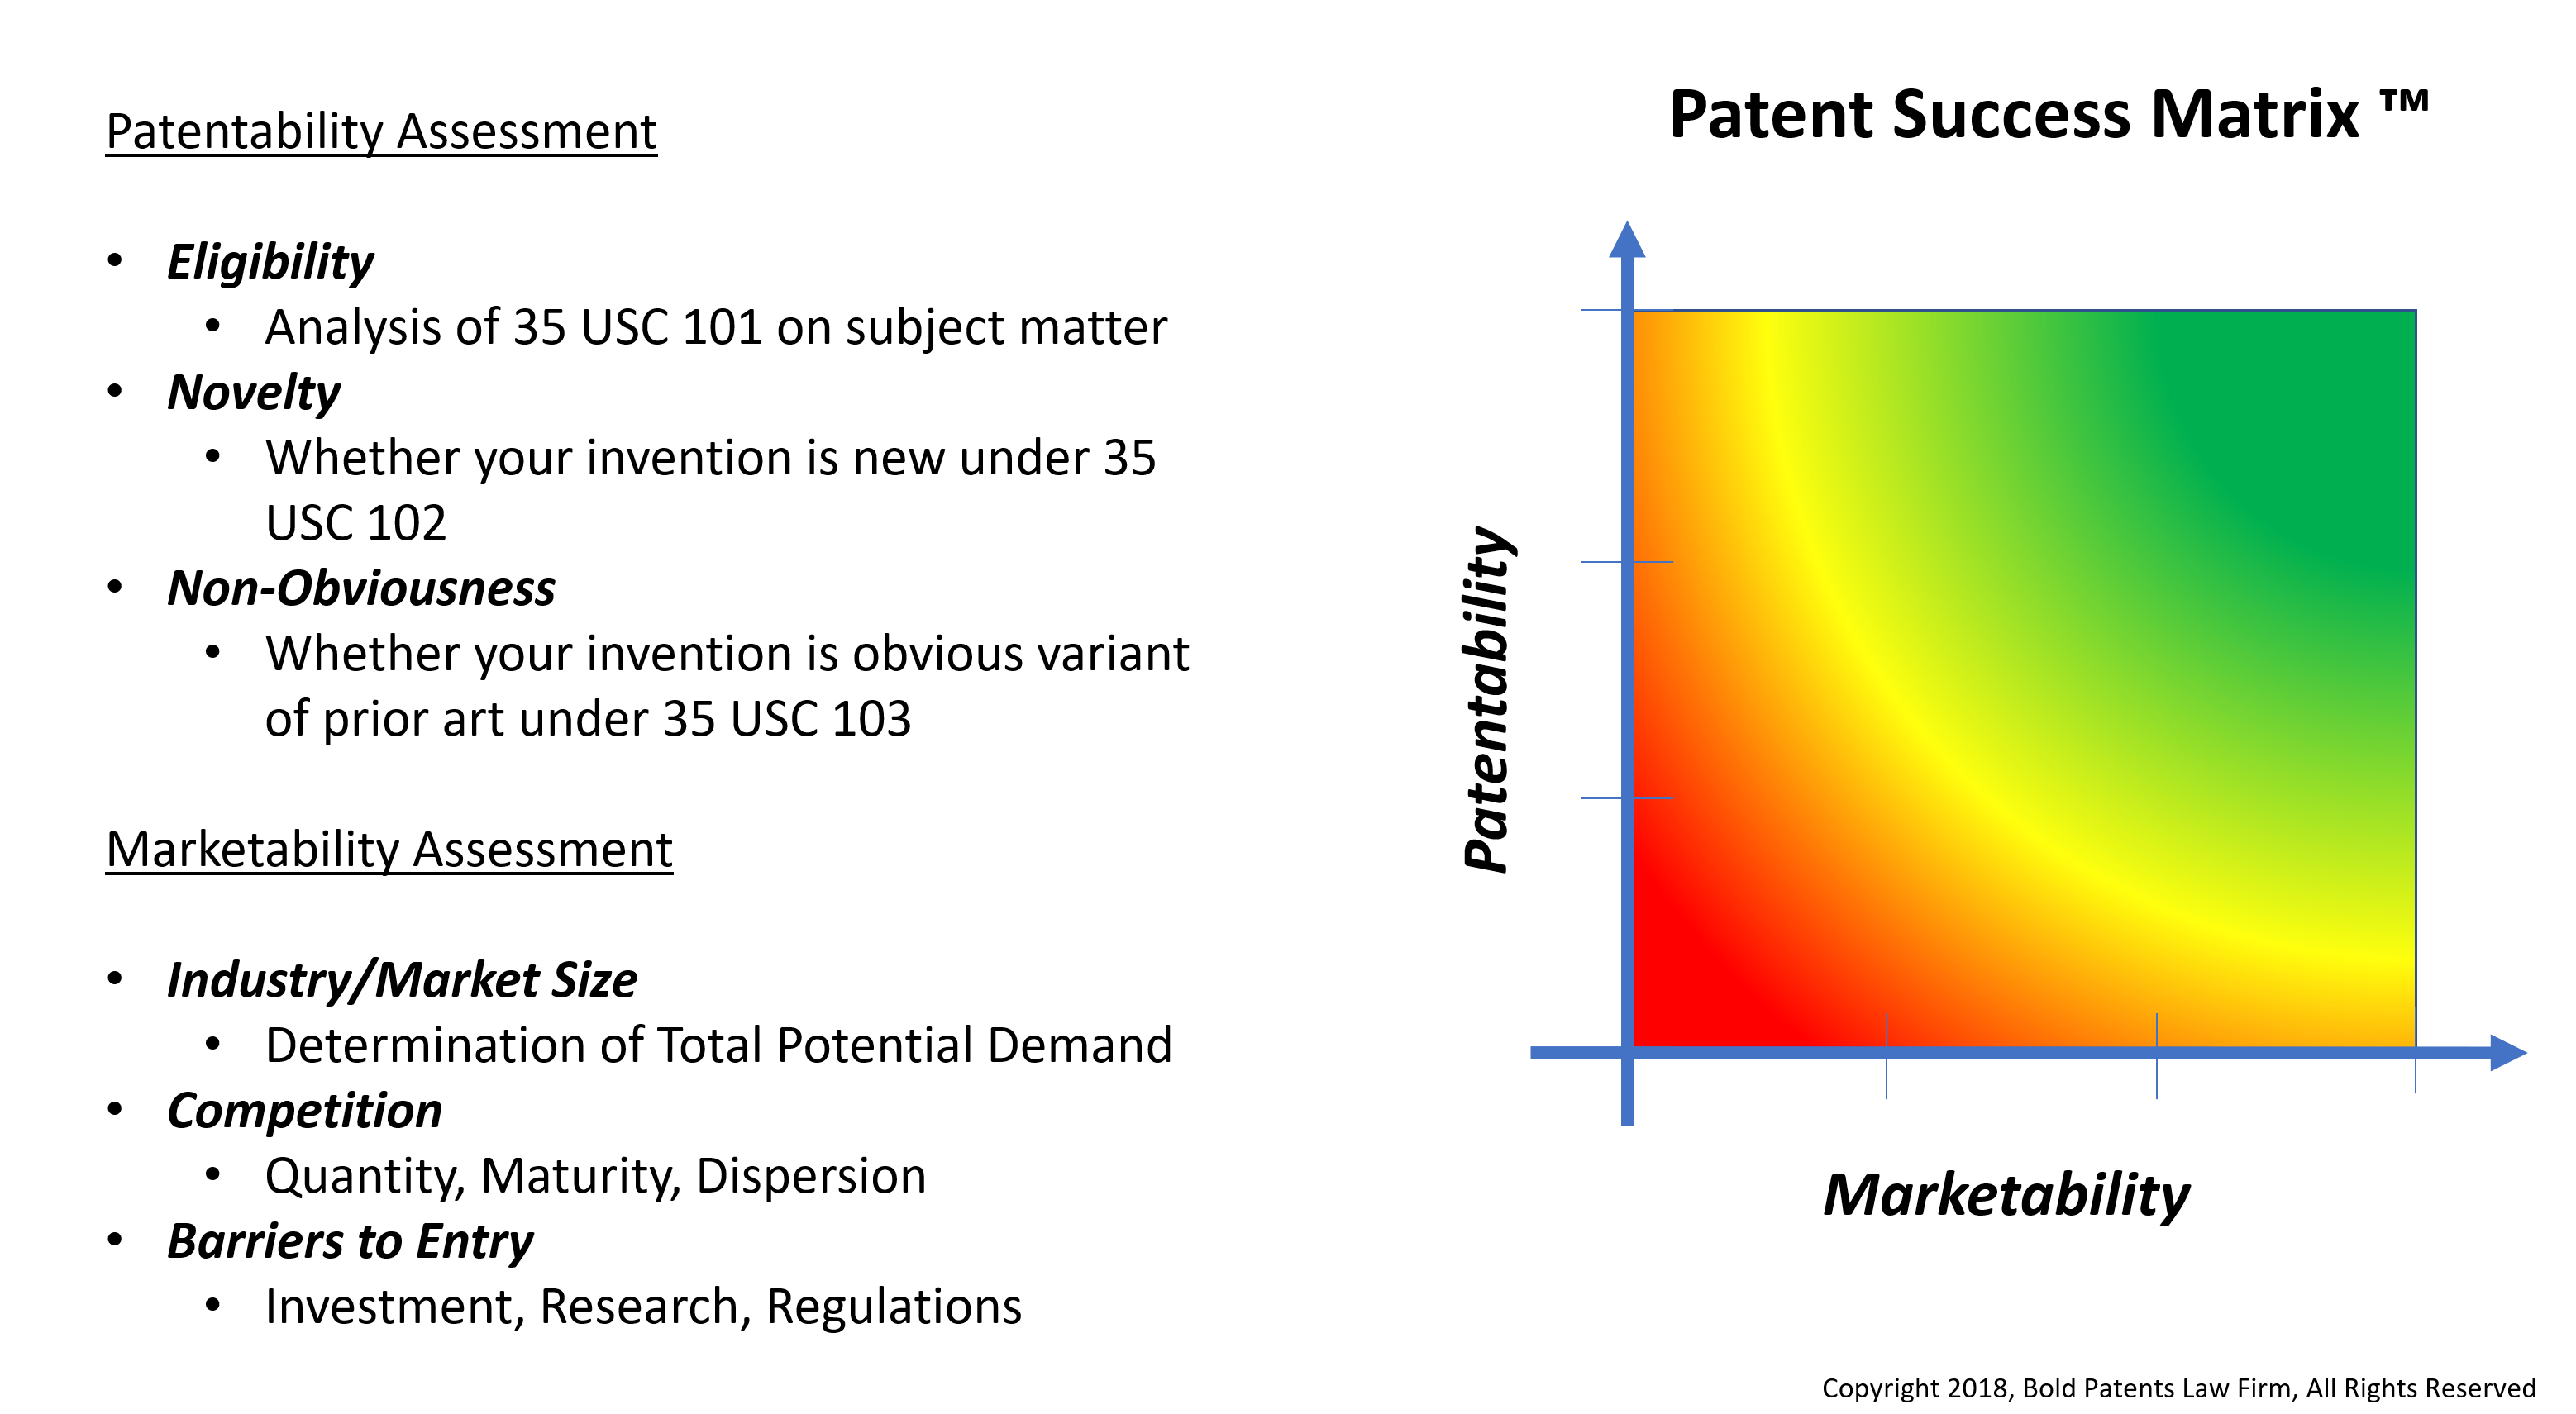 patent success matrix